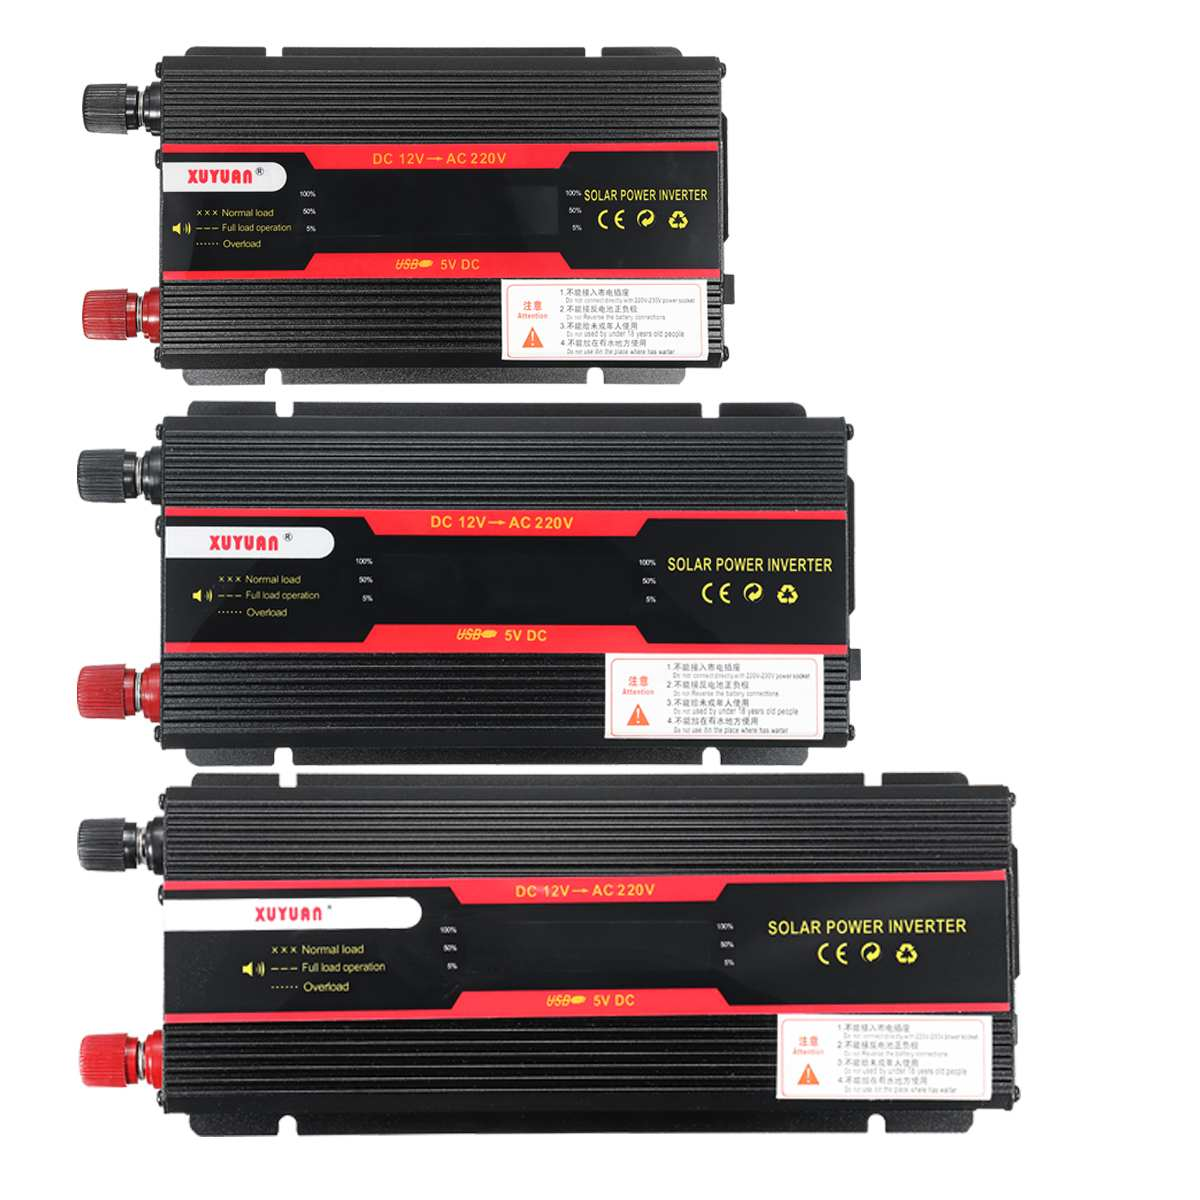 Car Inverter 12V 220V 6000W Pe ak Power Inverter Voltage Convertor Transformer 12V/24V To 110V/220V Inversor + LCD Display 18